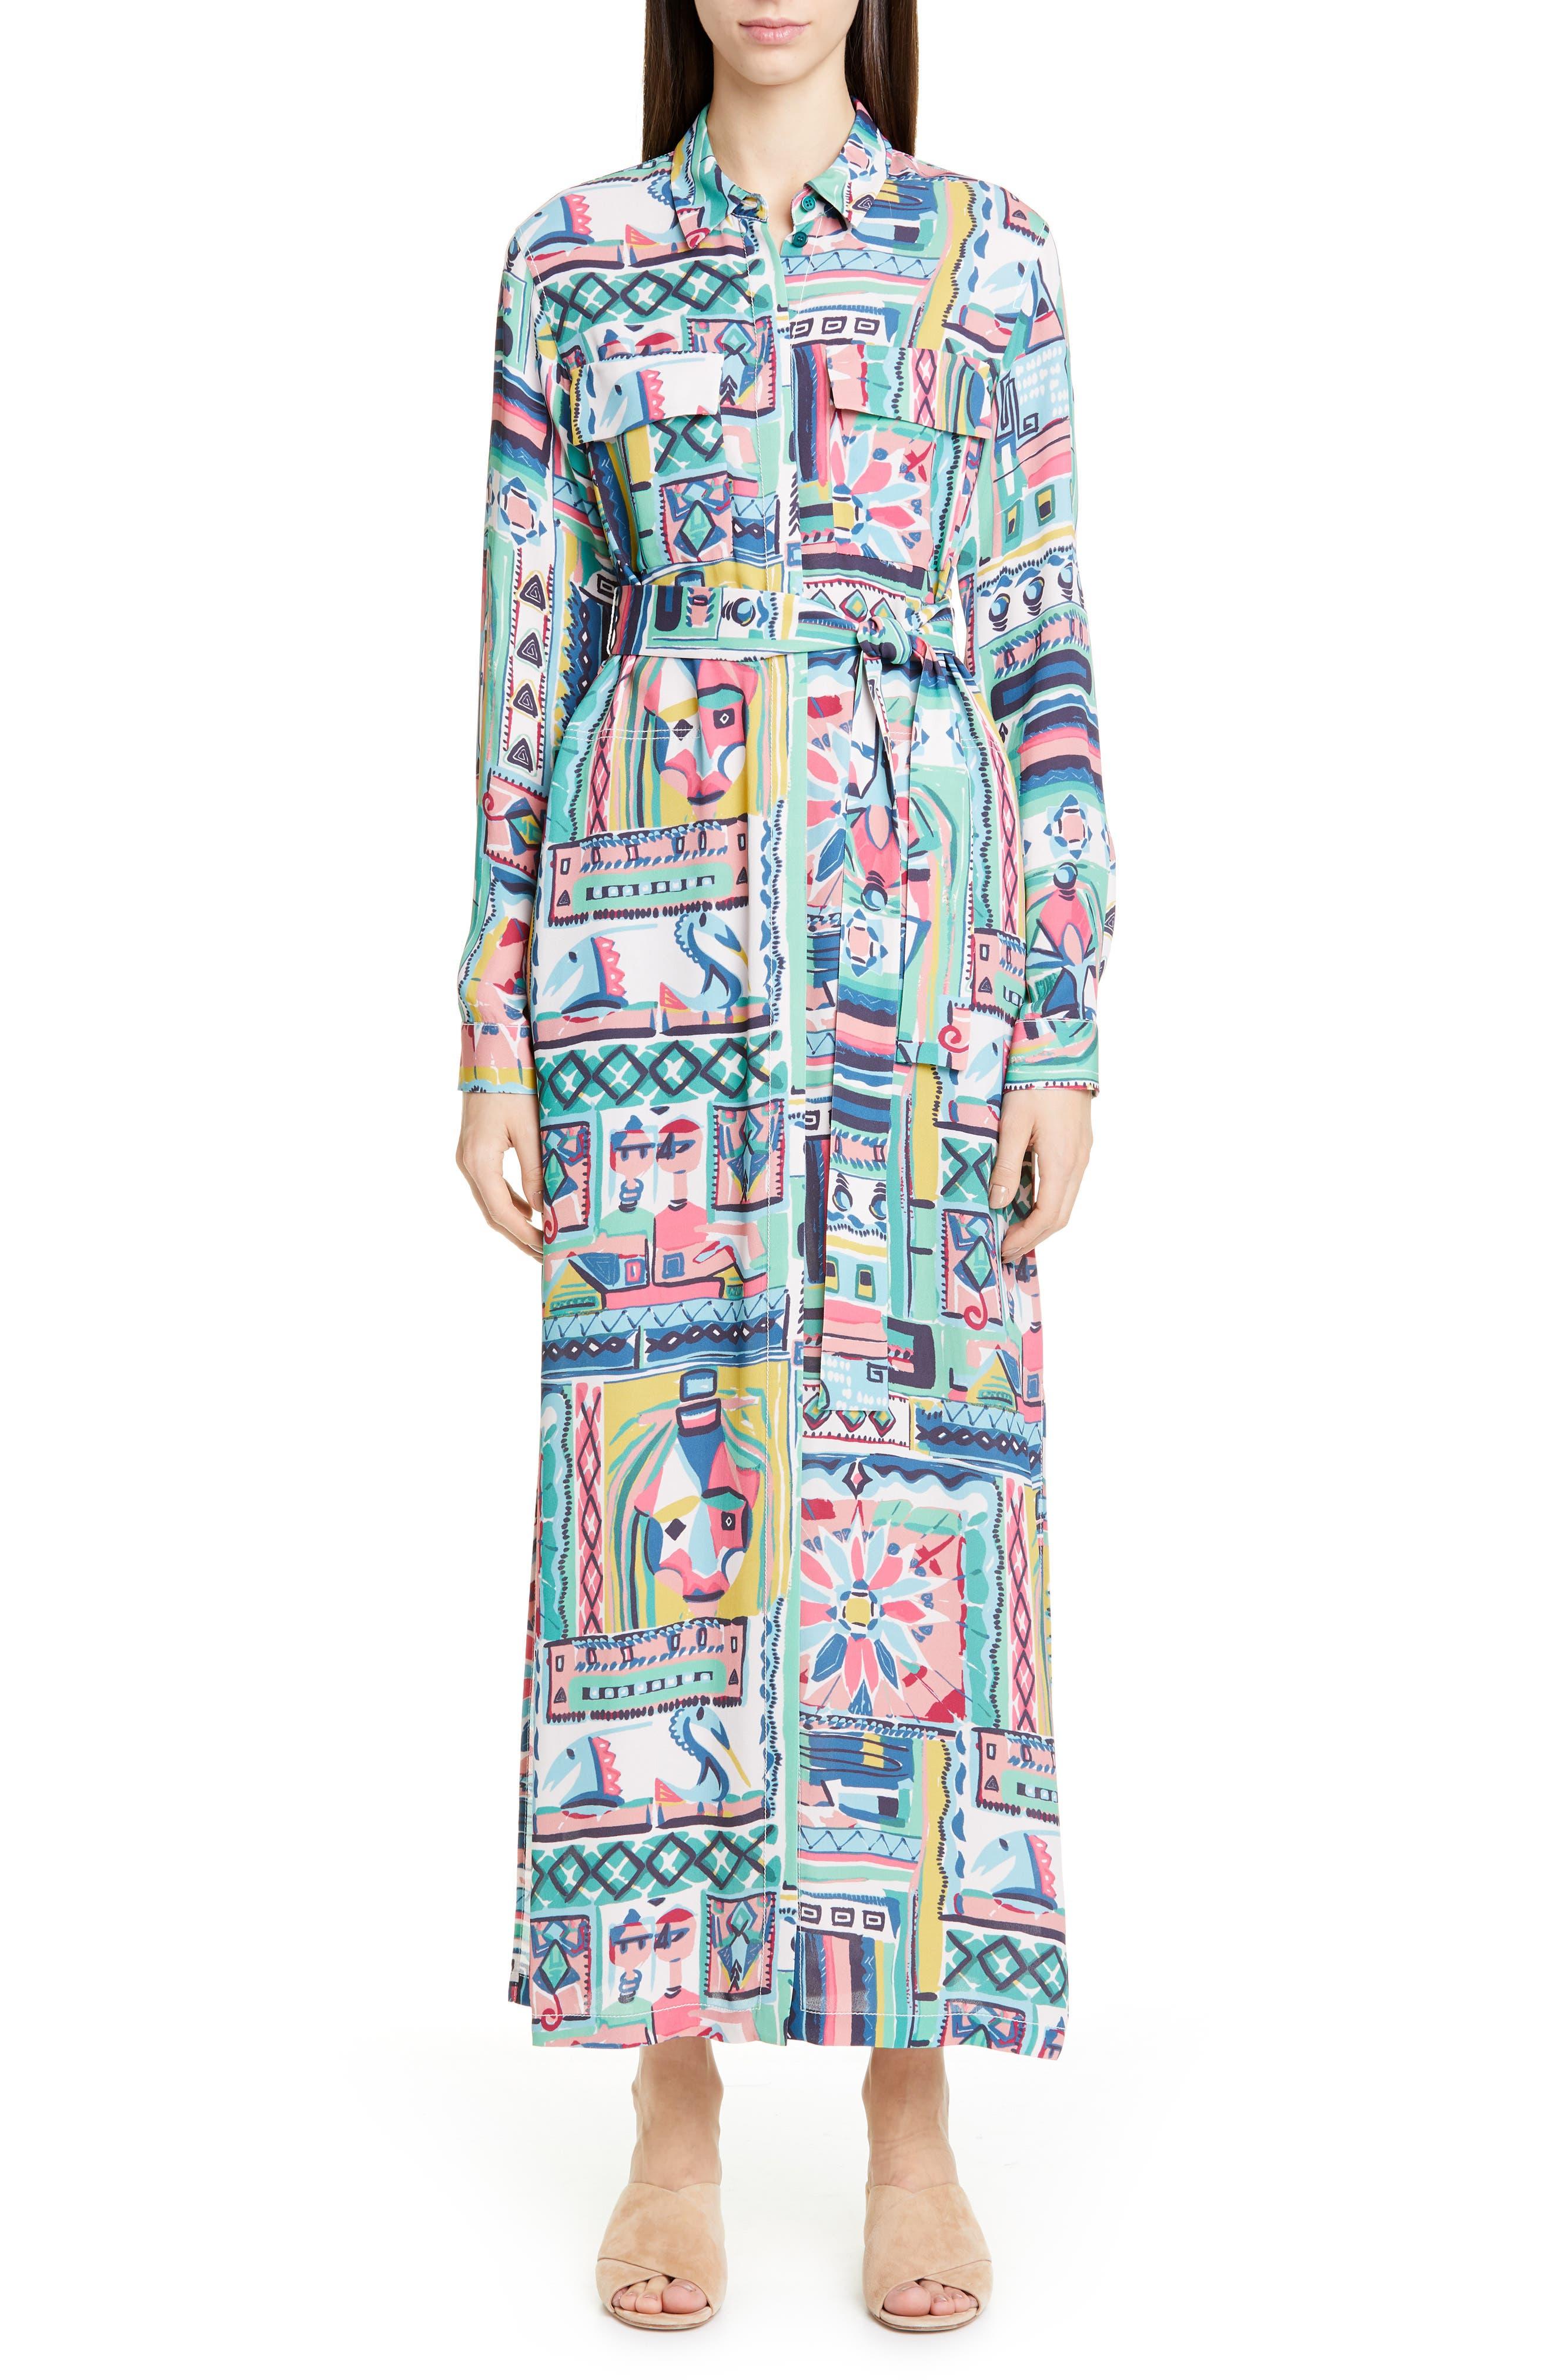 LAFAYETTE 148 NEW YORK, Doha Palazzo Patchwork Print Maxi Shirtdress, Main thumbnail 1, color, 400